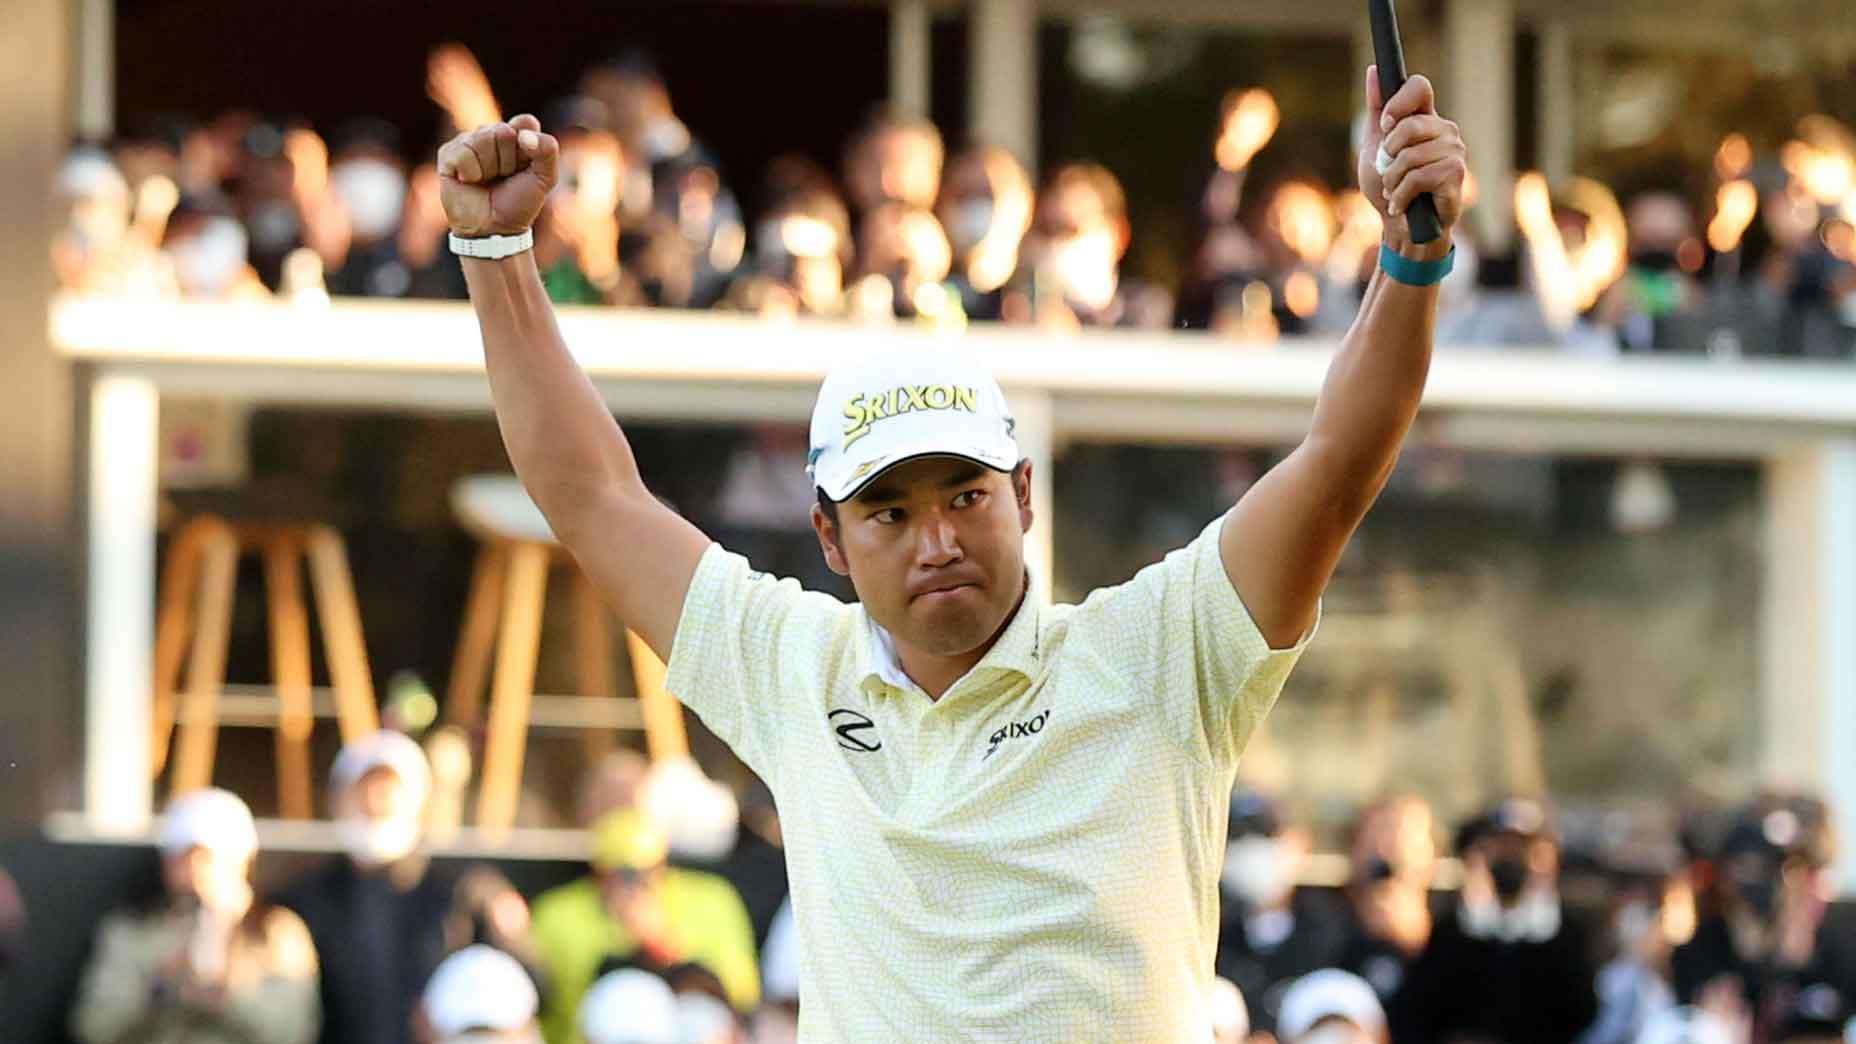 Hideki Matsuyama raises his arms in victory